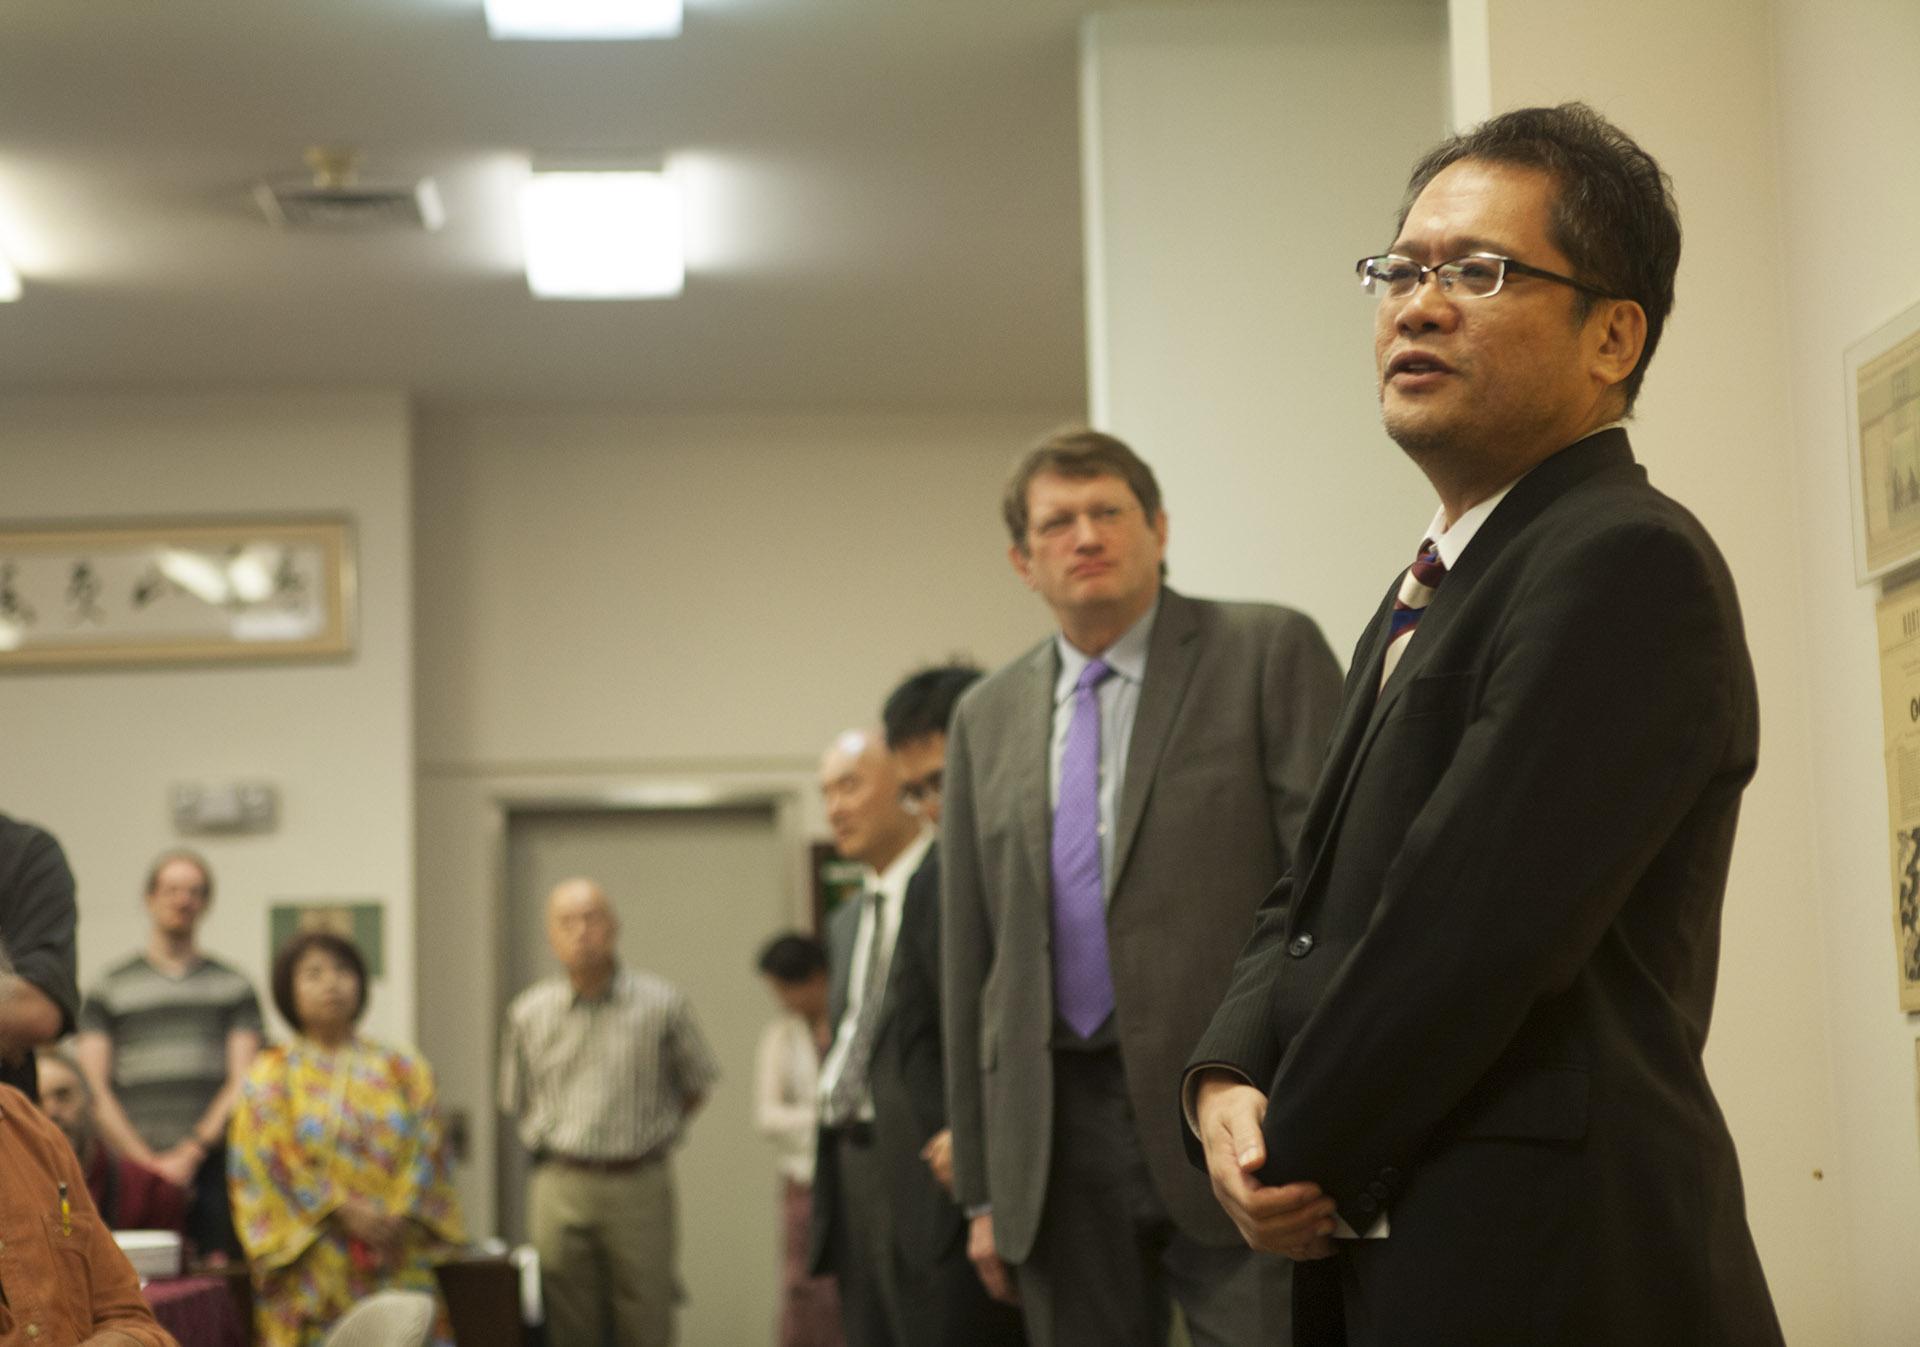 Mr. Hiroshi Yamashiro 9P from the Nihon Ki-in